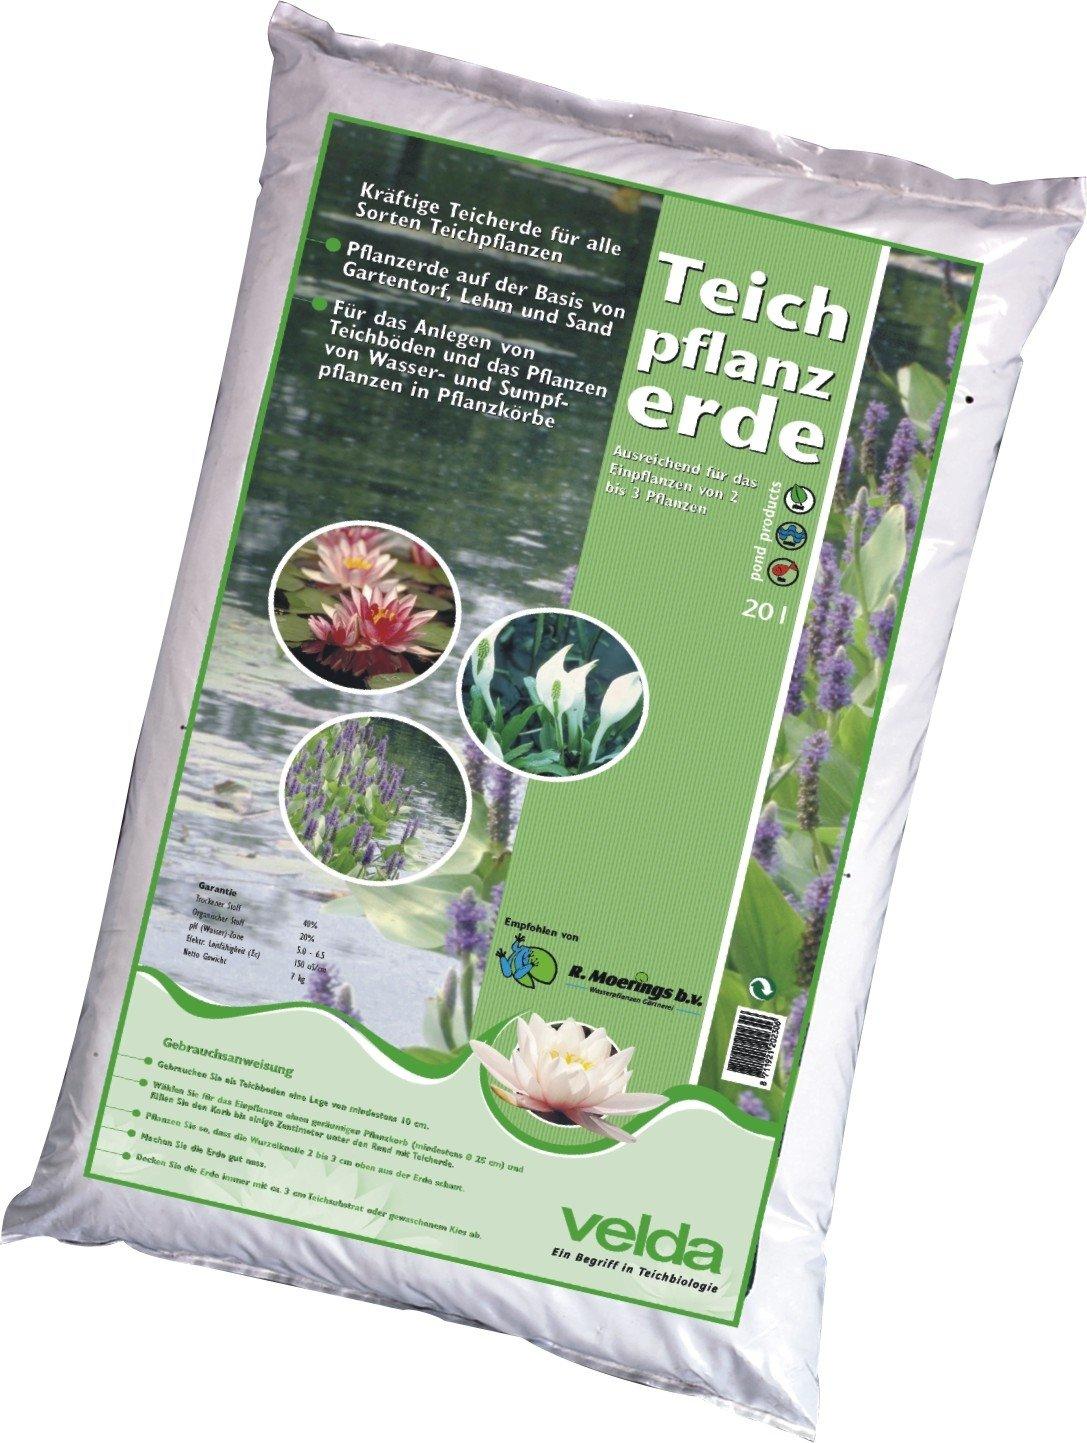 Aquatic Compost, Moerings Pond Plant Soil, 20 litres. Velda